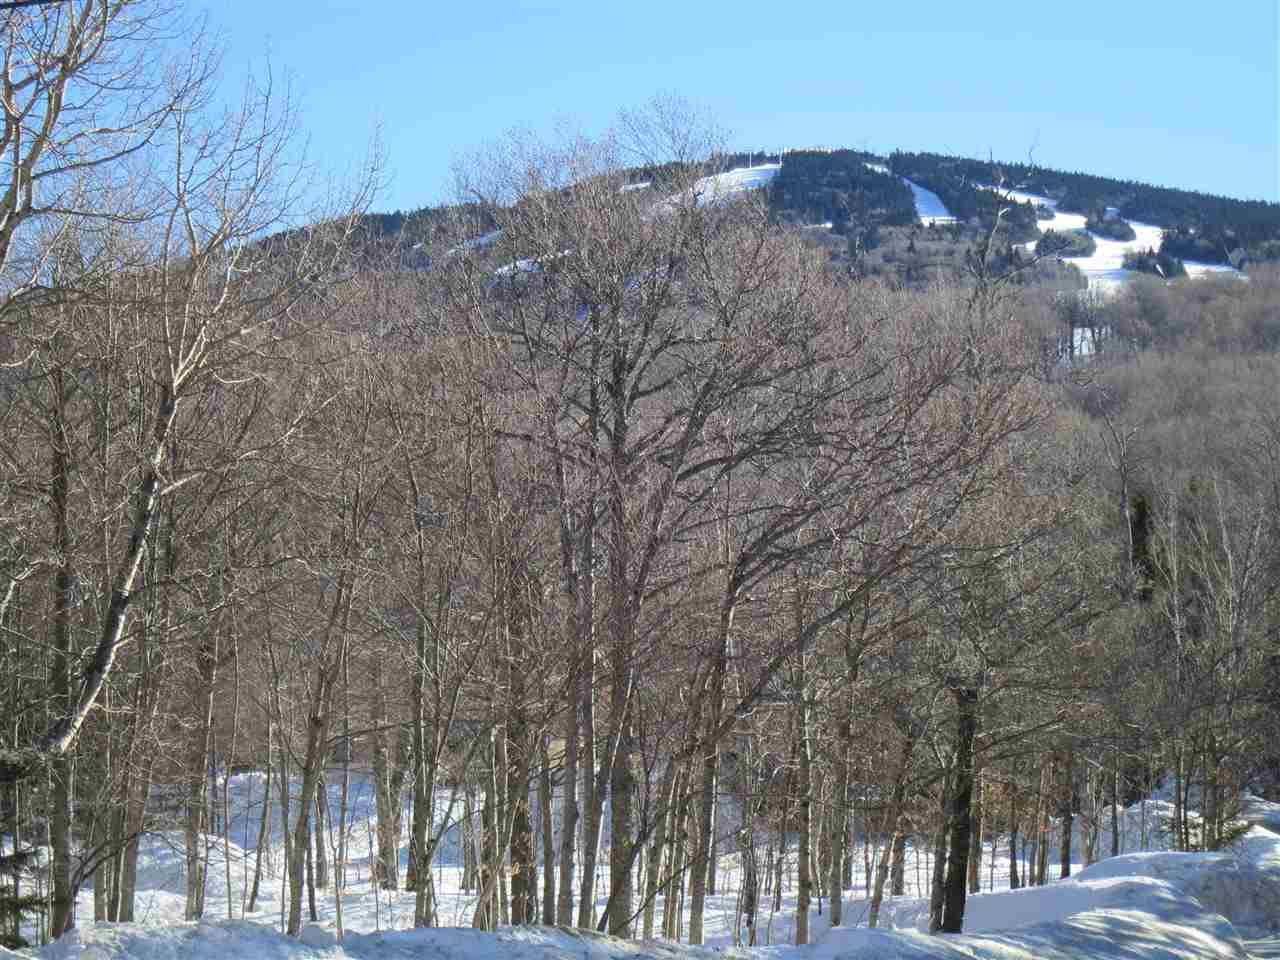 Mount-Snow-Real-Estate-4615709-3